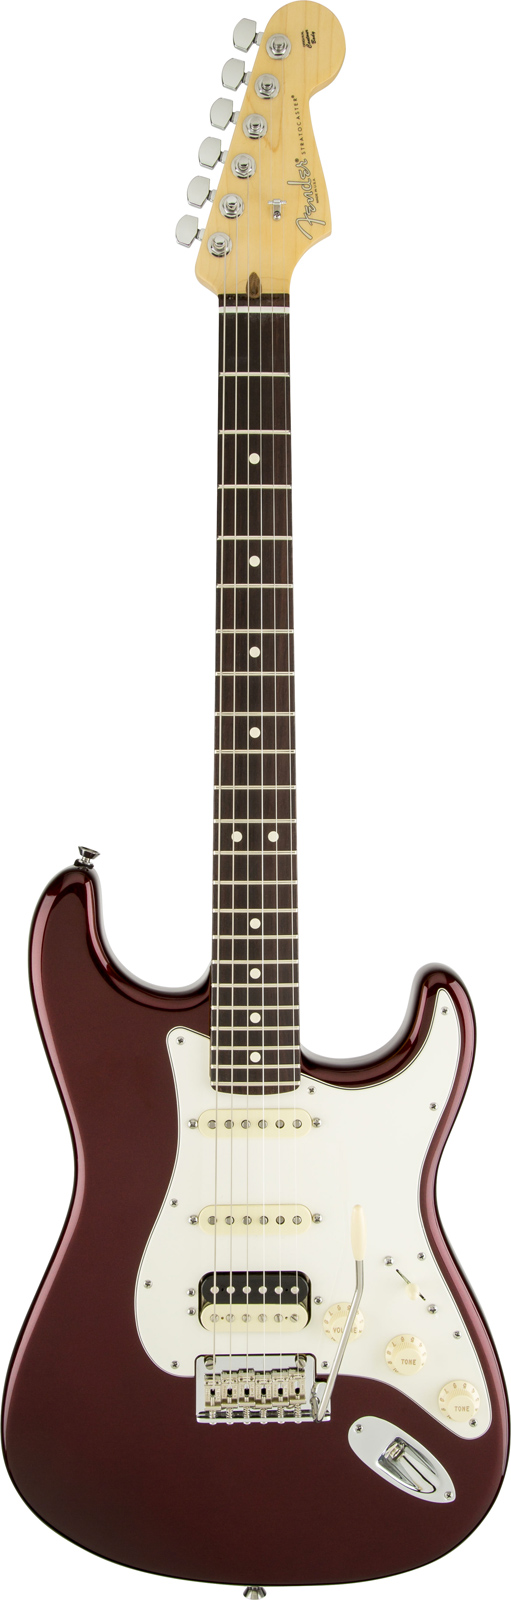 Fender American Standard Stratocaster Hss Shawbucker Rw Bordeaux Metallic + Etui